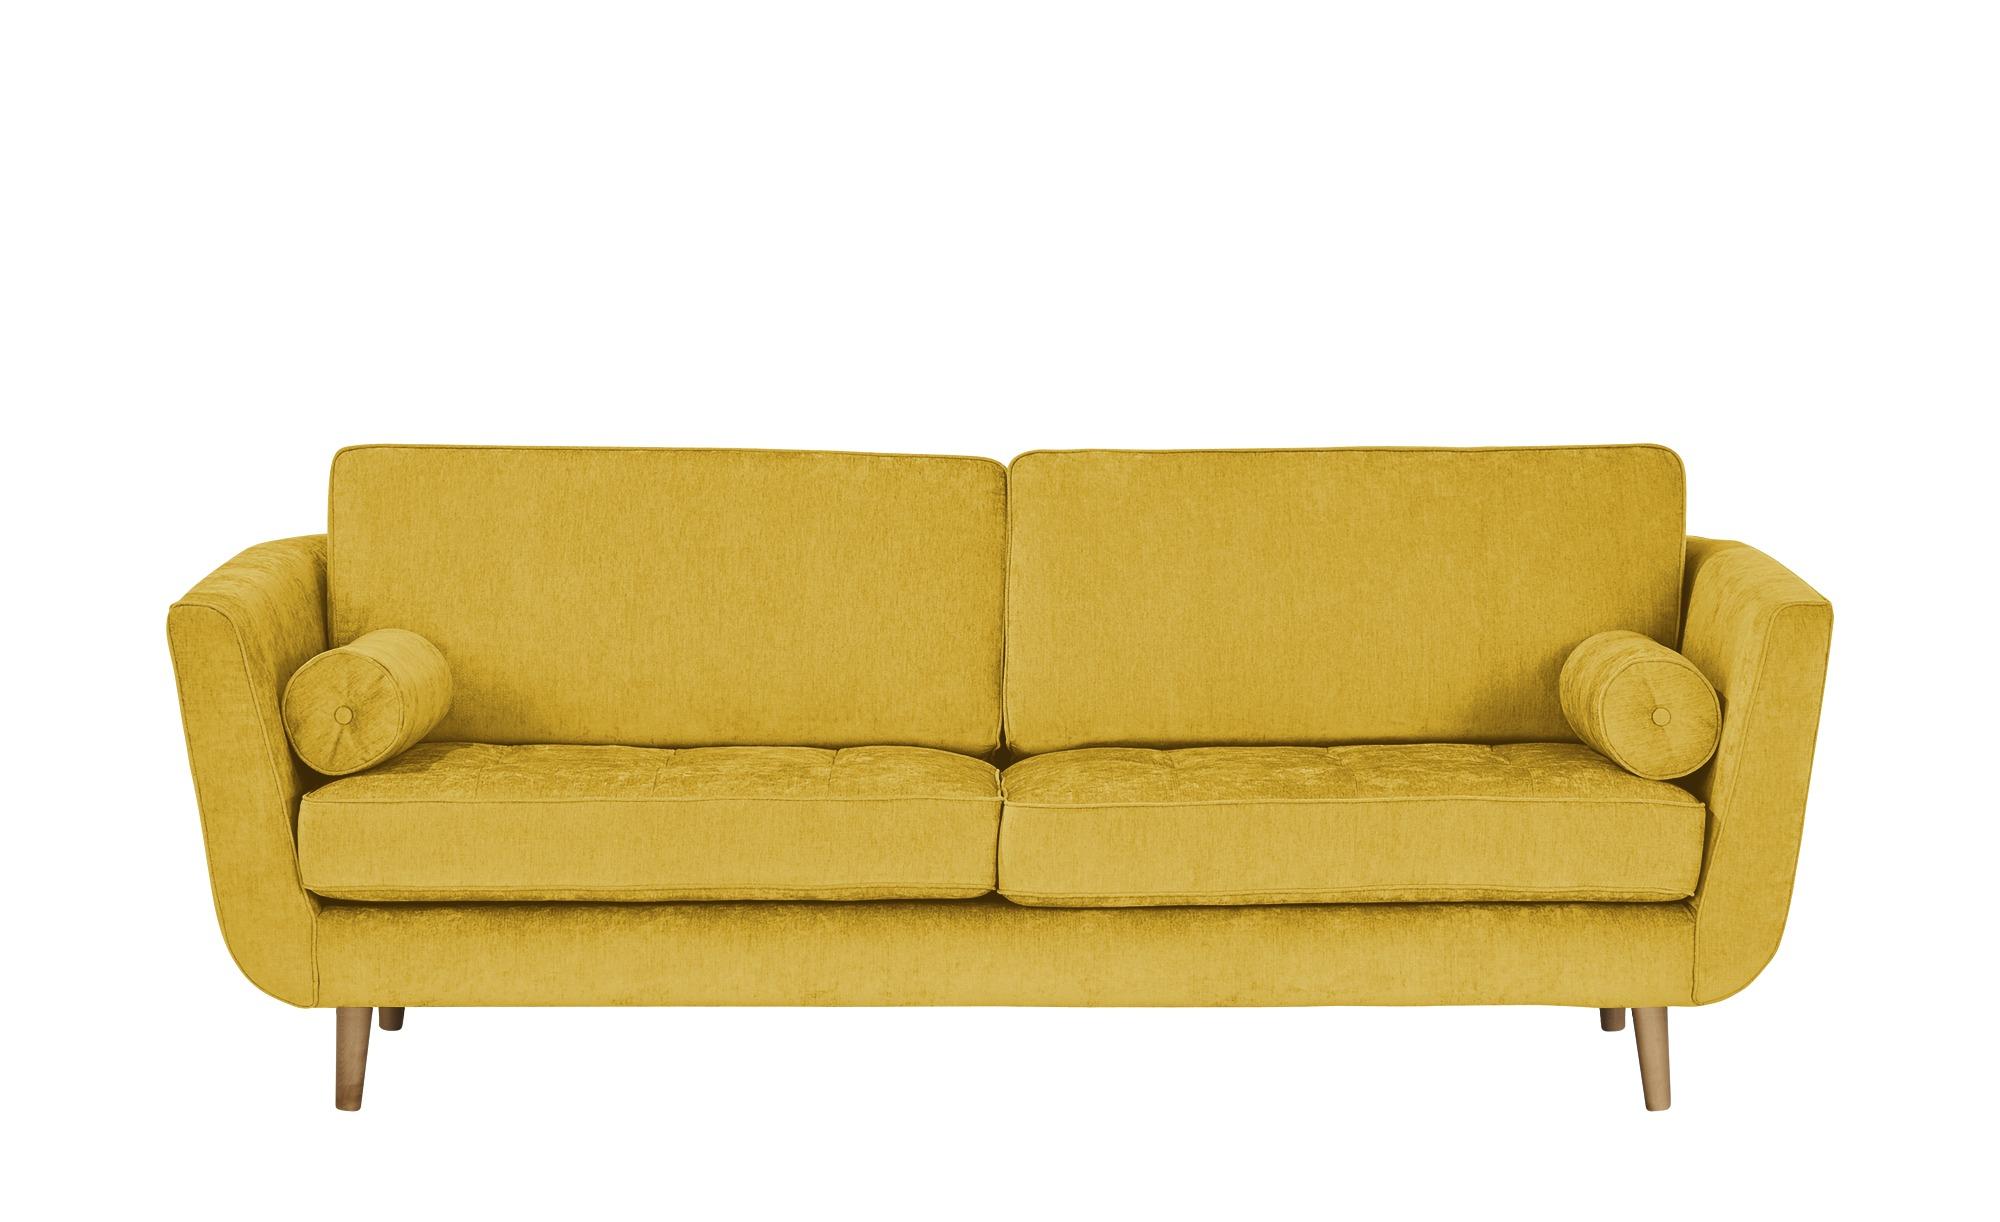 SOHO Sofa 3-sitzig  Zehra ¦ gelb ¦ Maße (cm): B: 226 H: 85 T: 96 Polstermöbel > Sofas > 3-Sitzer - Höffner